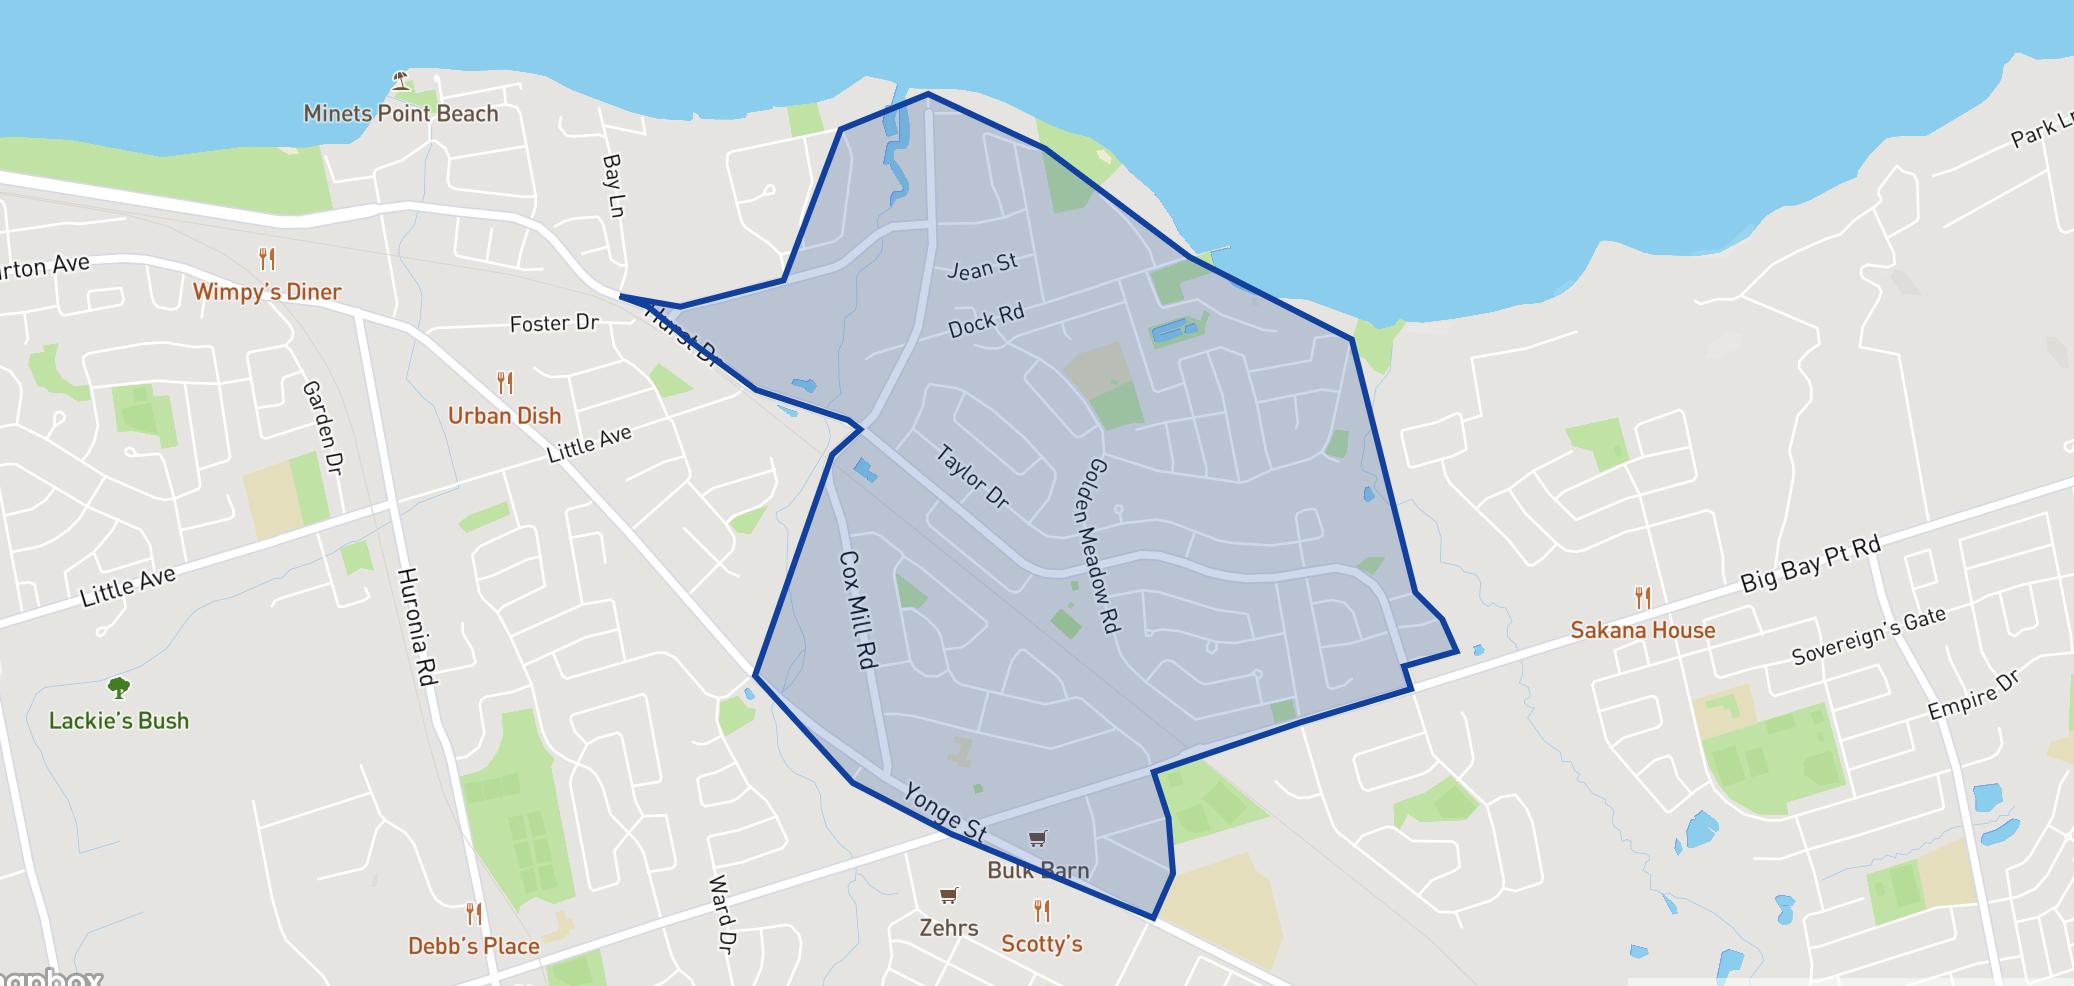 Algonquin Ridge Elementary School neighbourhood borders